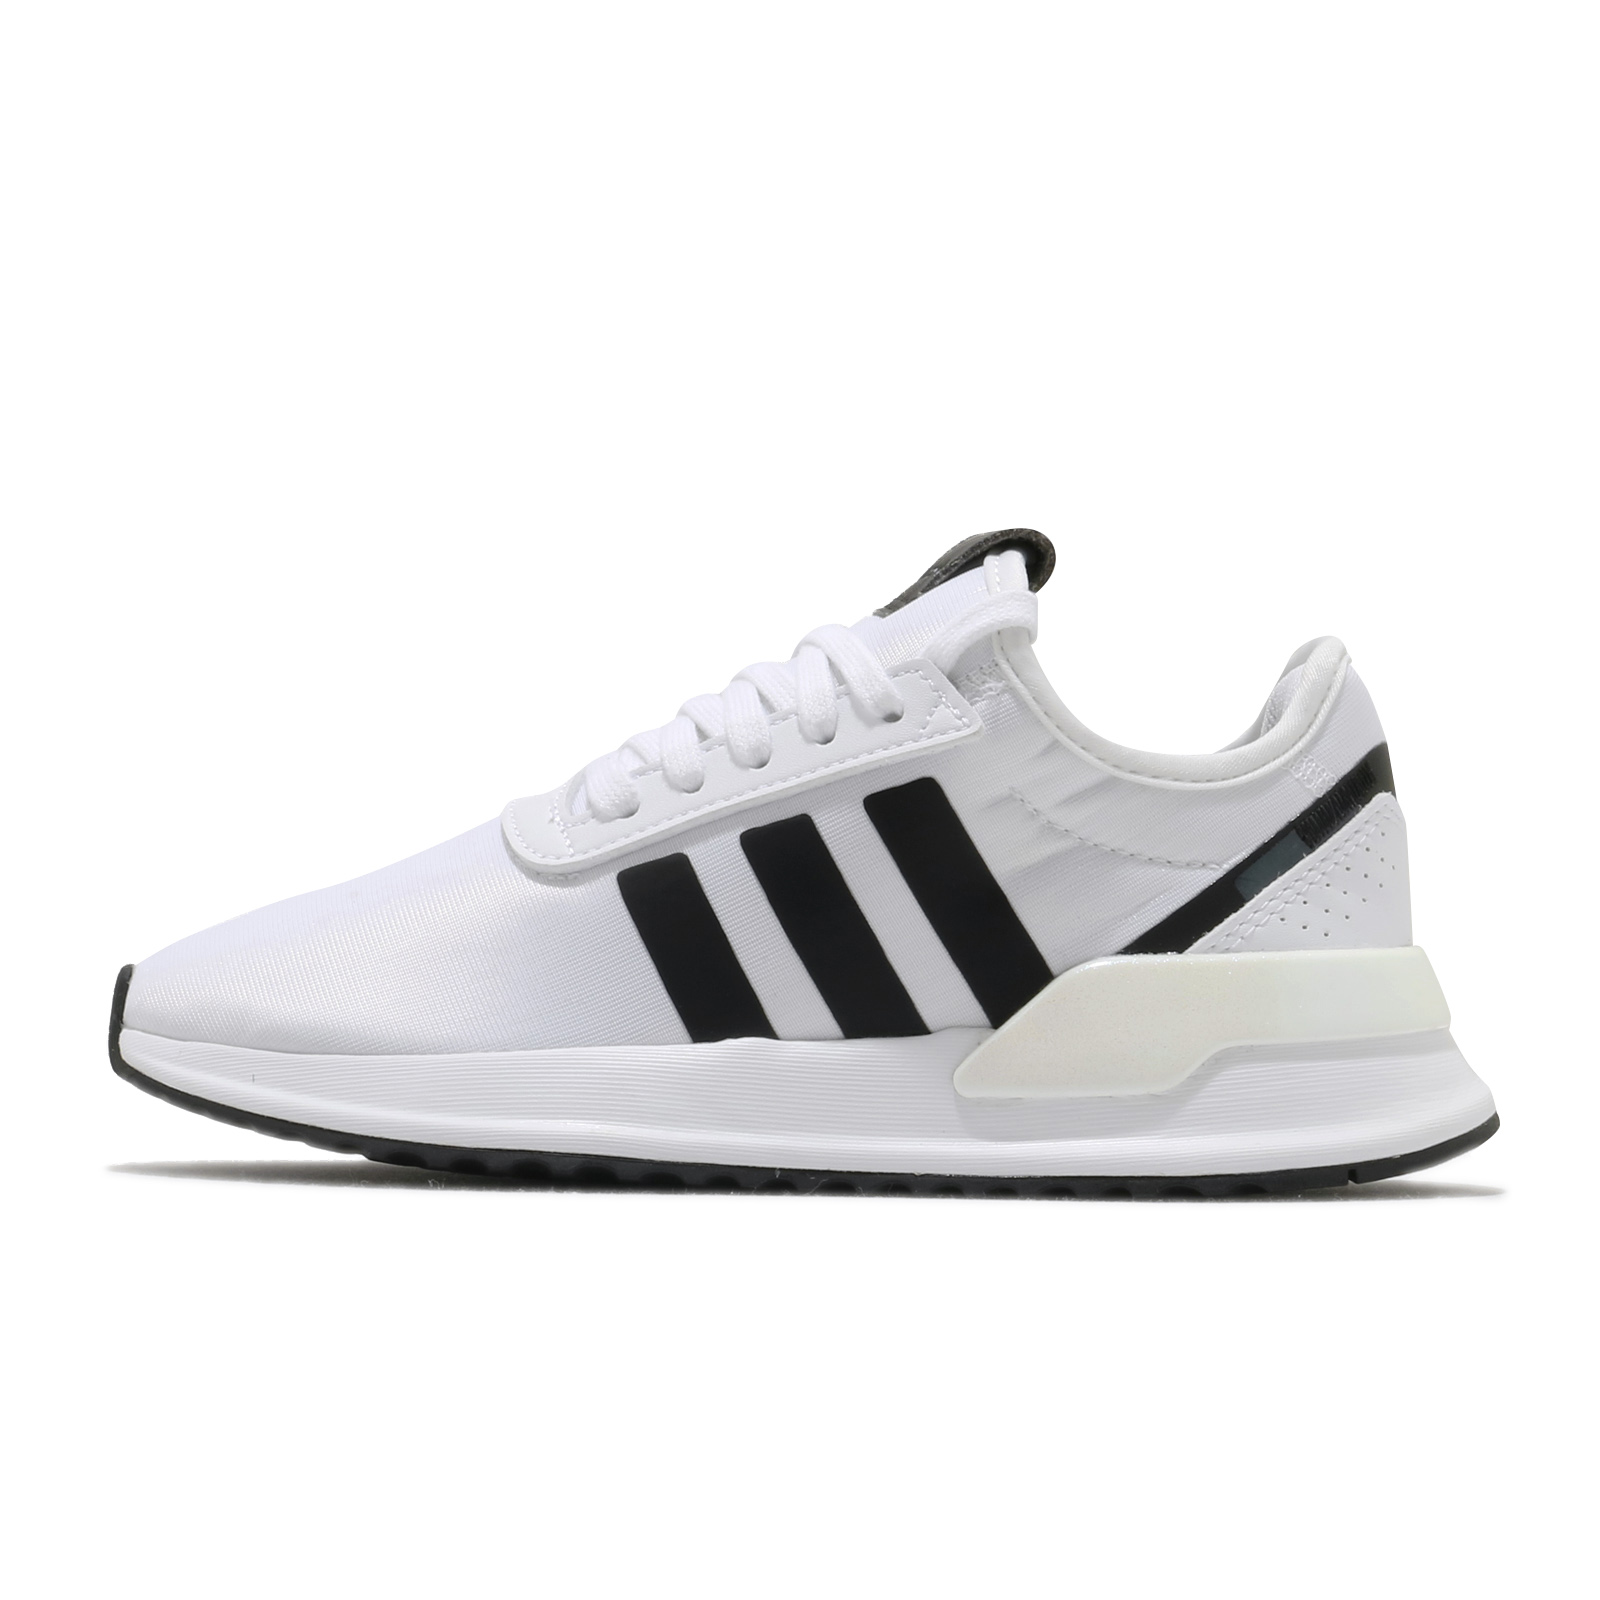 adidas 休閒鞋 U_Path X W 白 黑 愛迪達 三條線 女鞋 三葉草 基本款【ACS】 FV9255